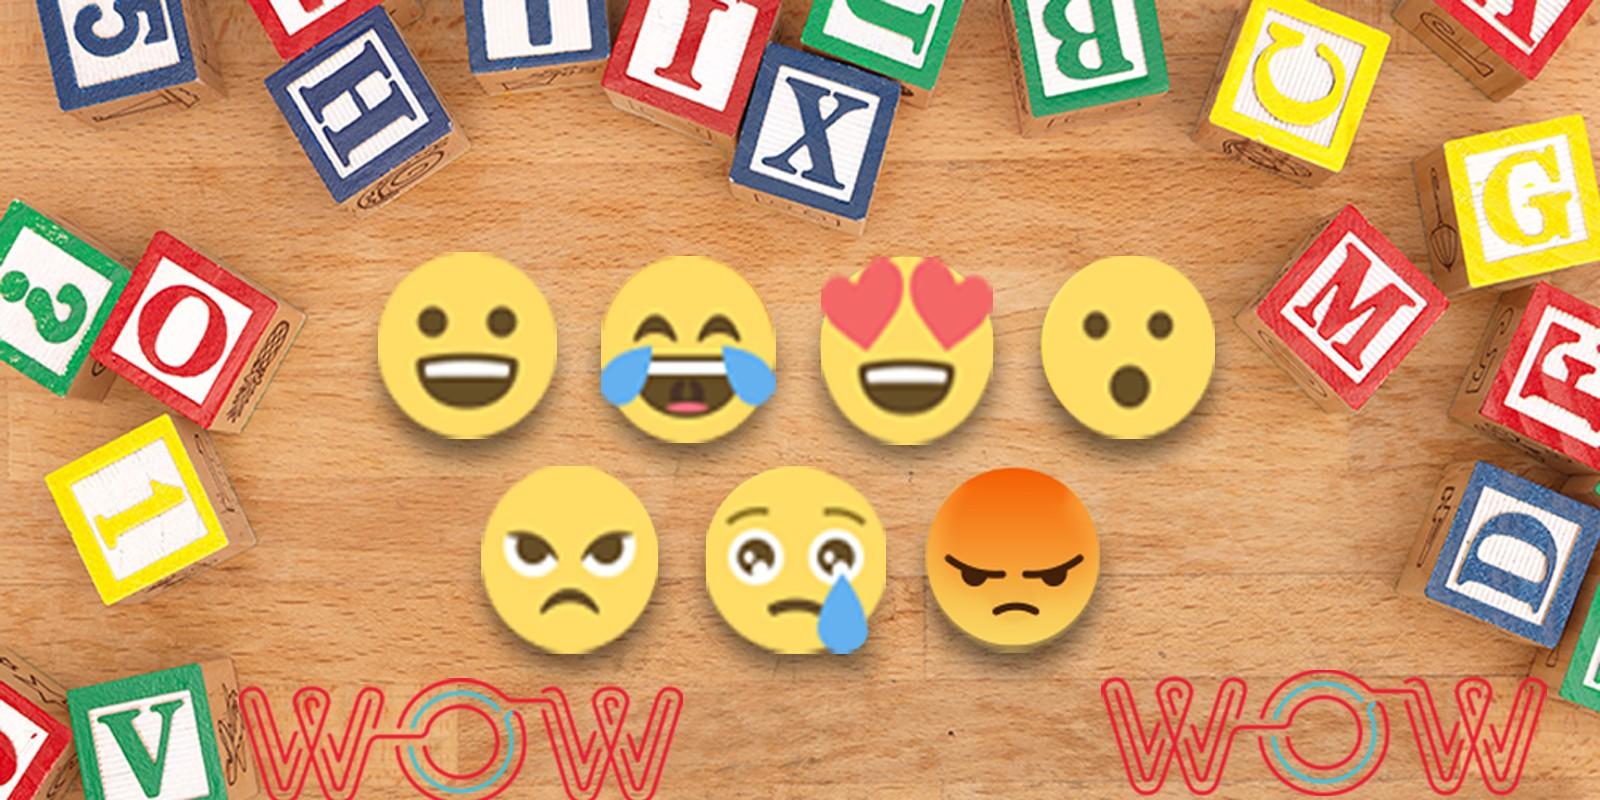 Wow Emoji Reaction Counter PHP Script